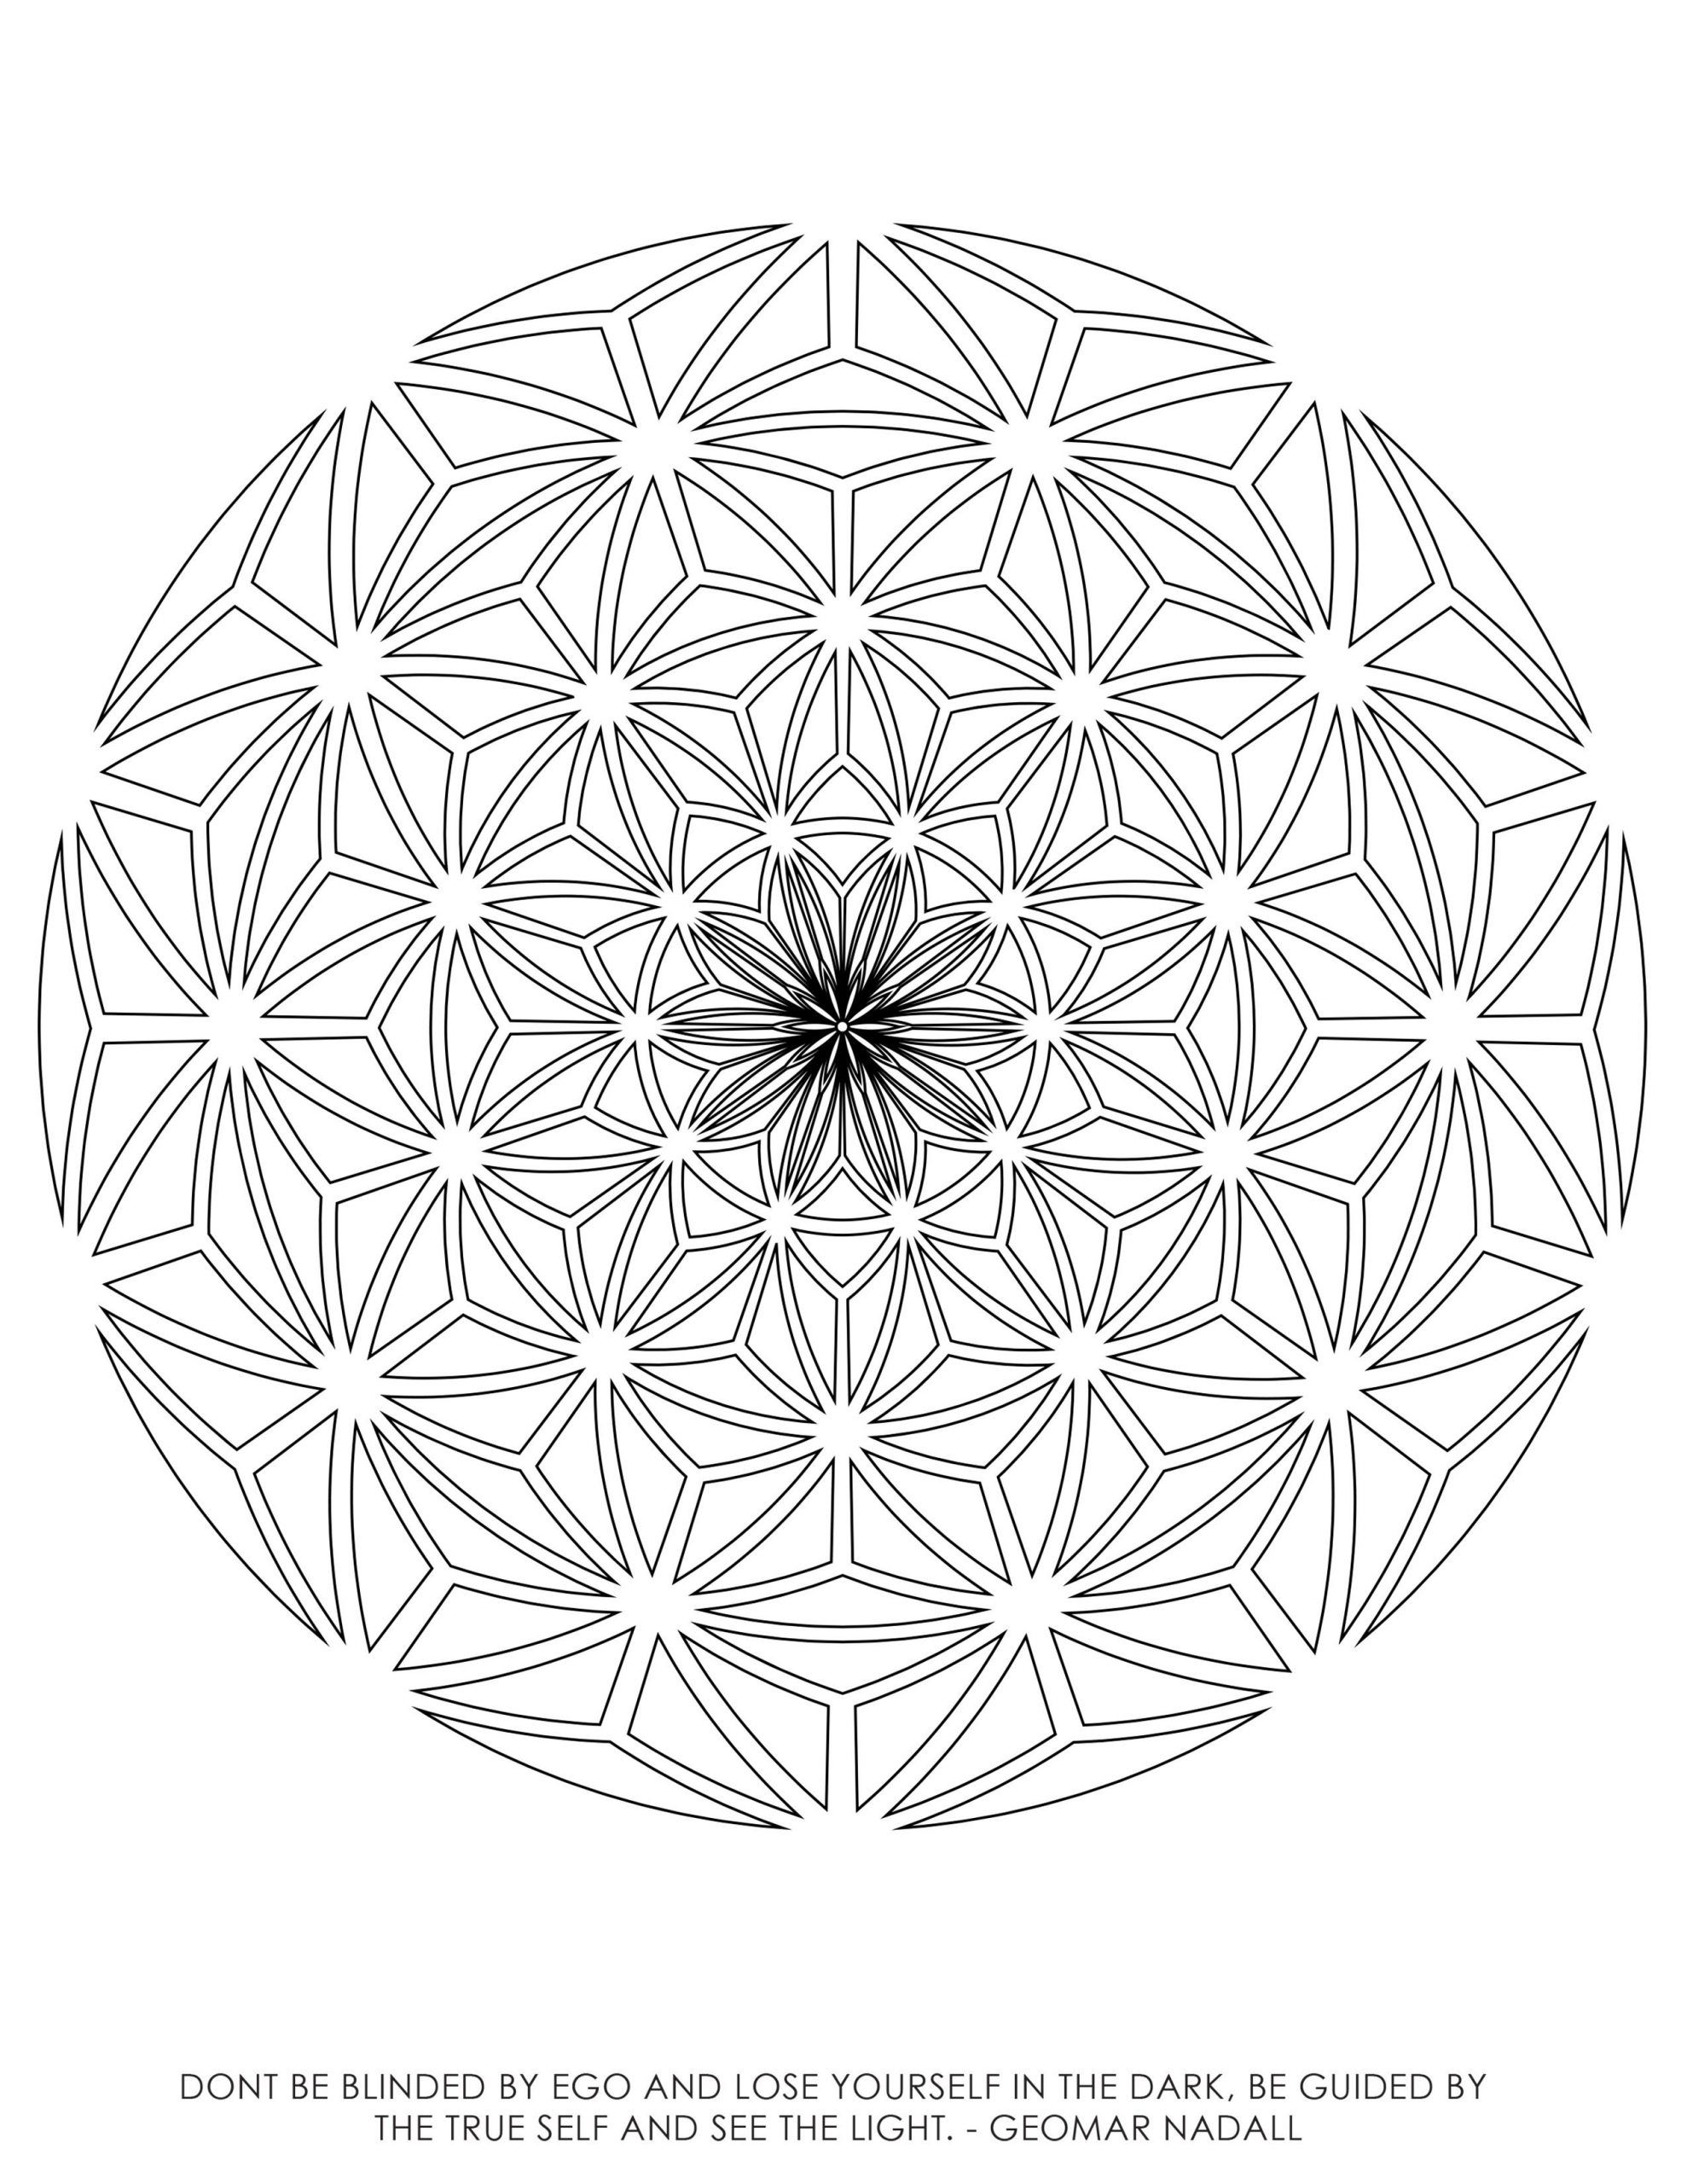 Google Image Result For Https Www Slavyanka Org Wp Content Uploads Geometric Patterns Co Mandala Coloring Pages Geometric Mandala Geometric Patterns Coloring